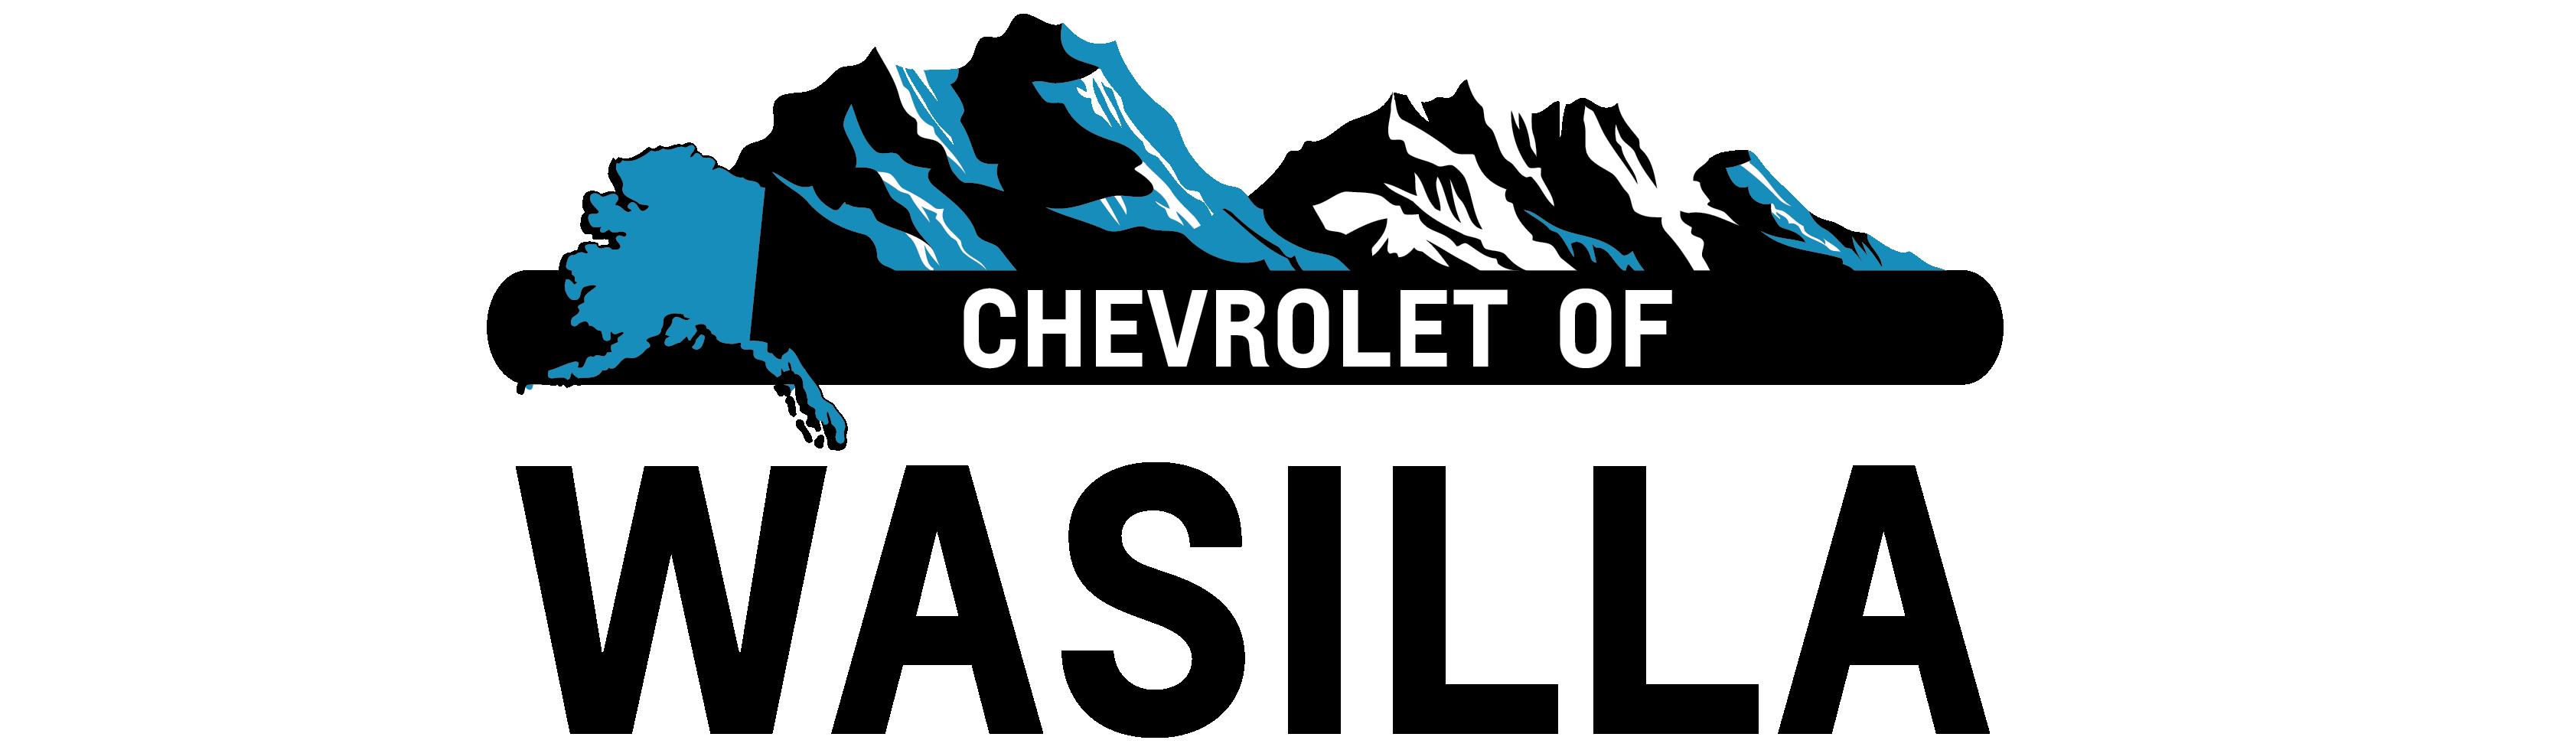 Chevrolet of Wasilla